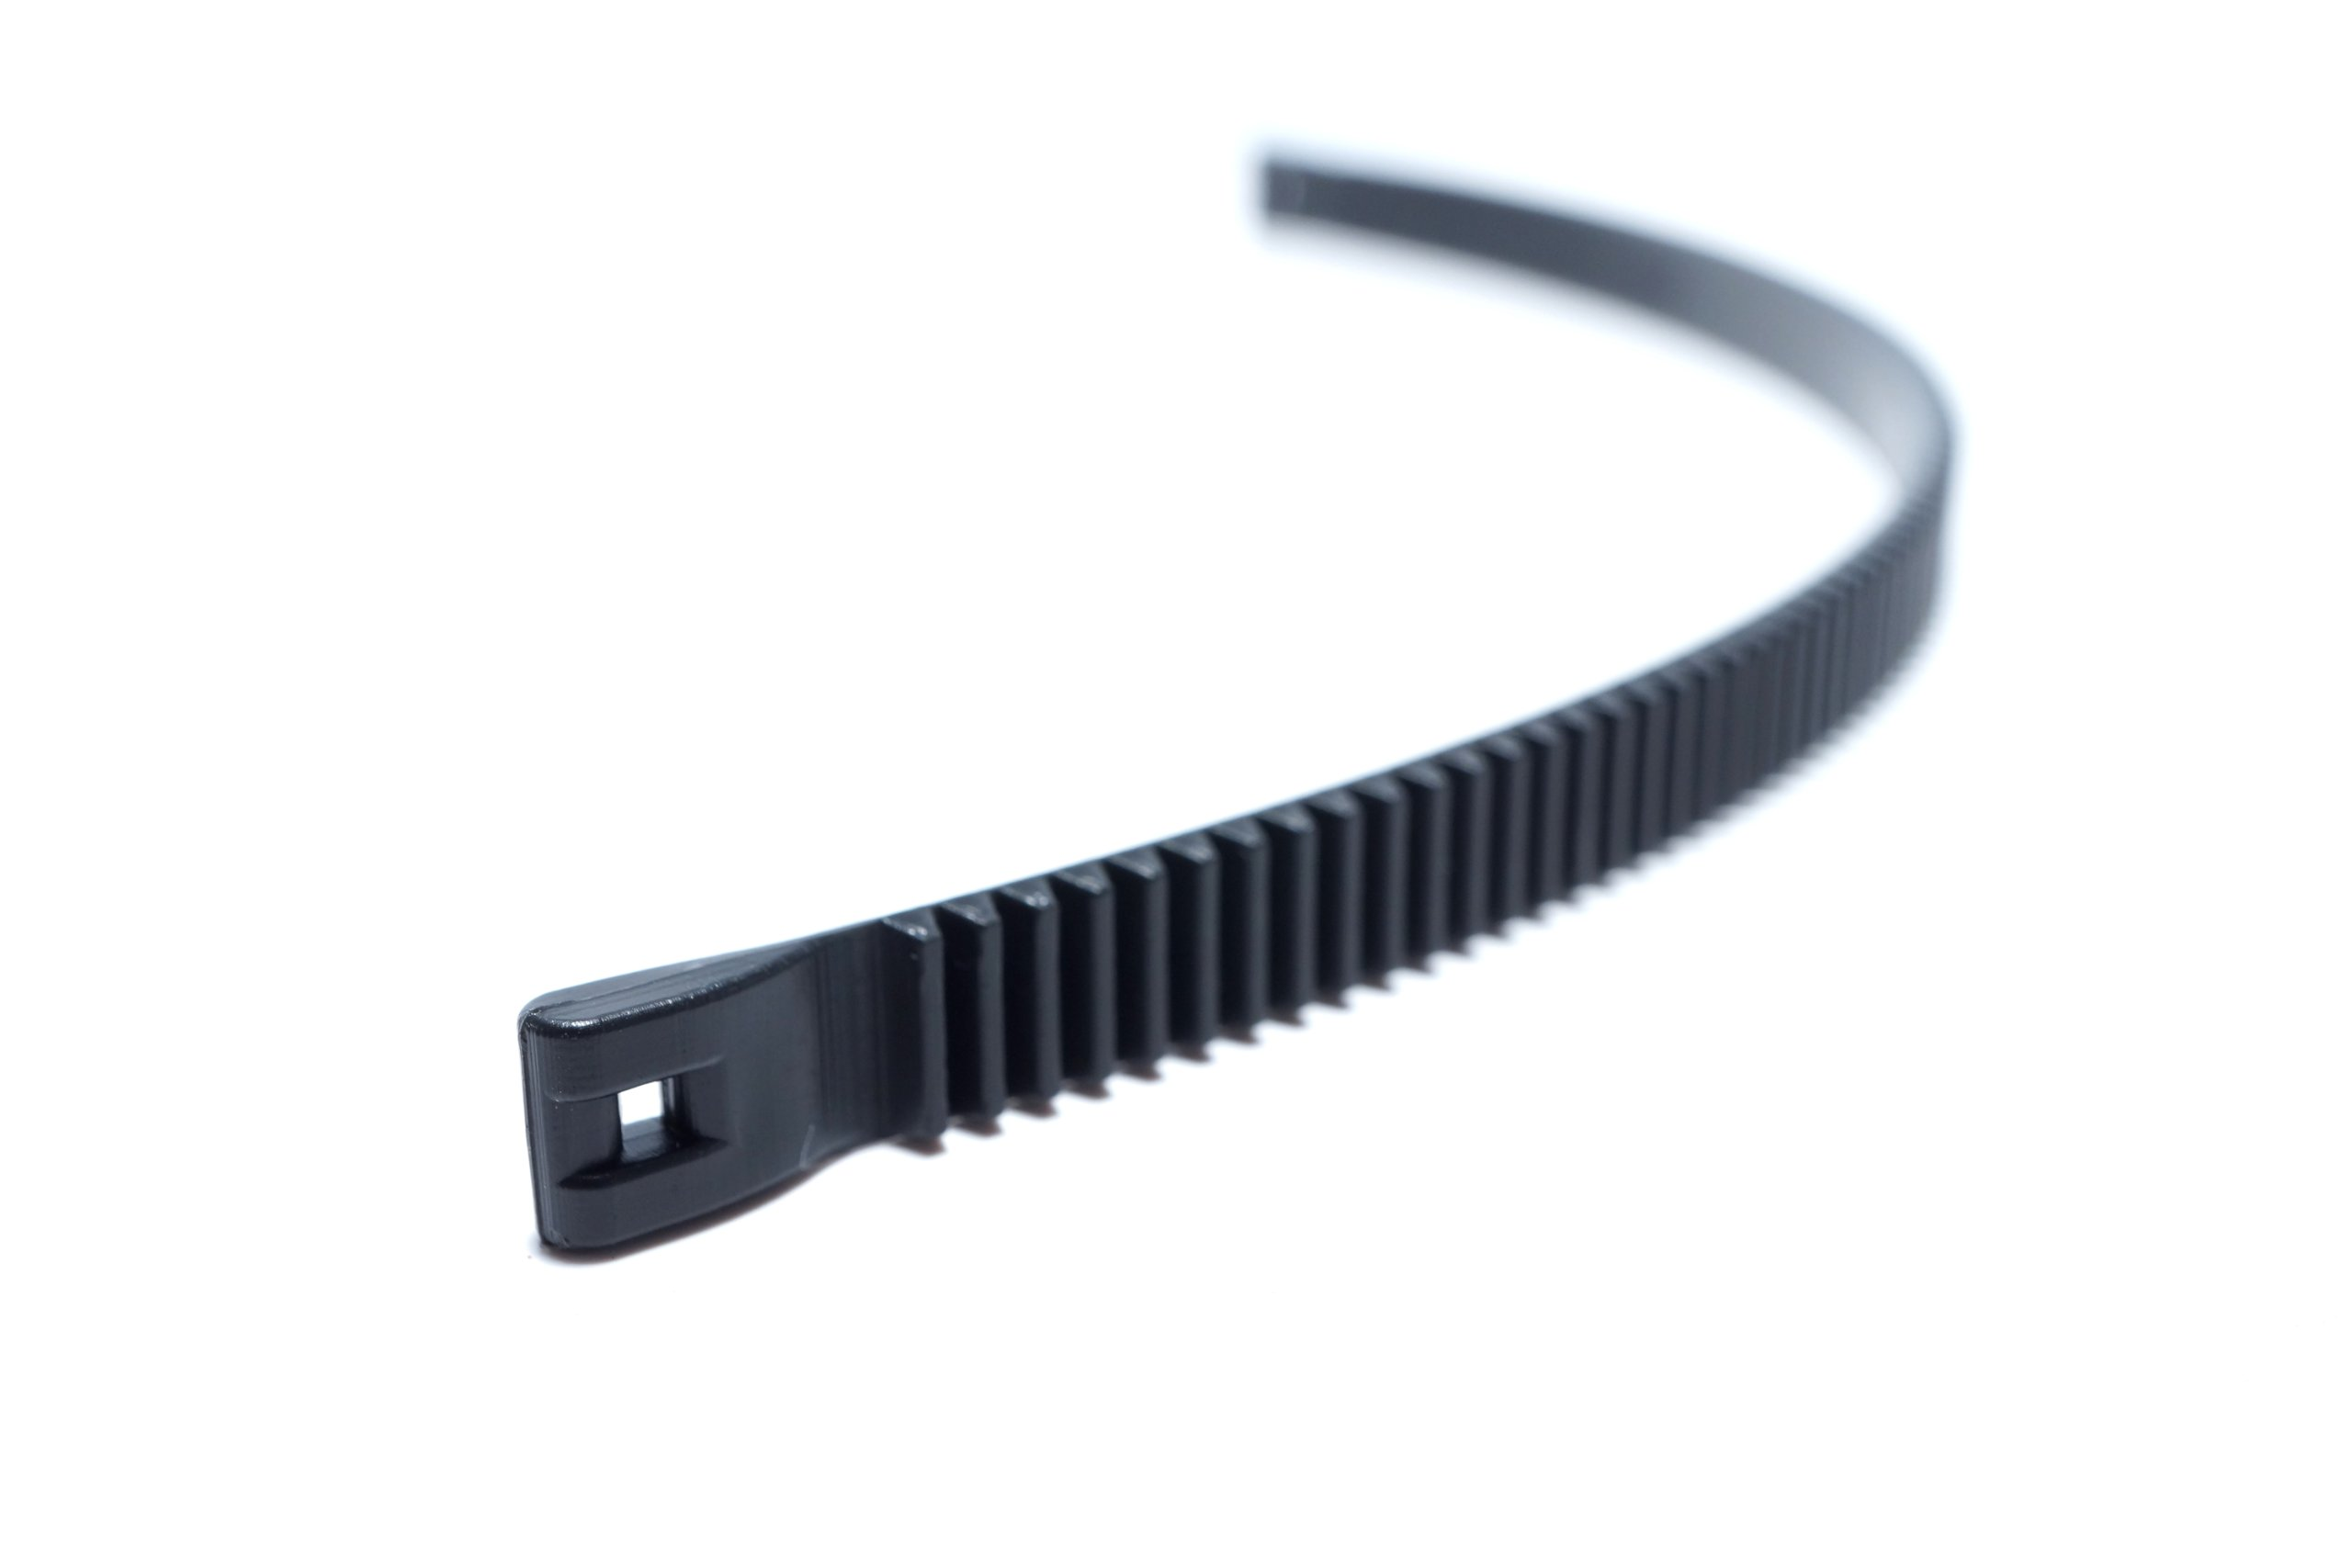 Lensgear Medium Plus Sized Lens Gear for Follow Focus, 9.25'' Long x 0.35'' Wide